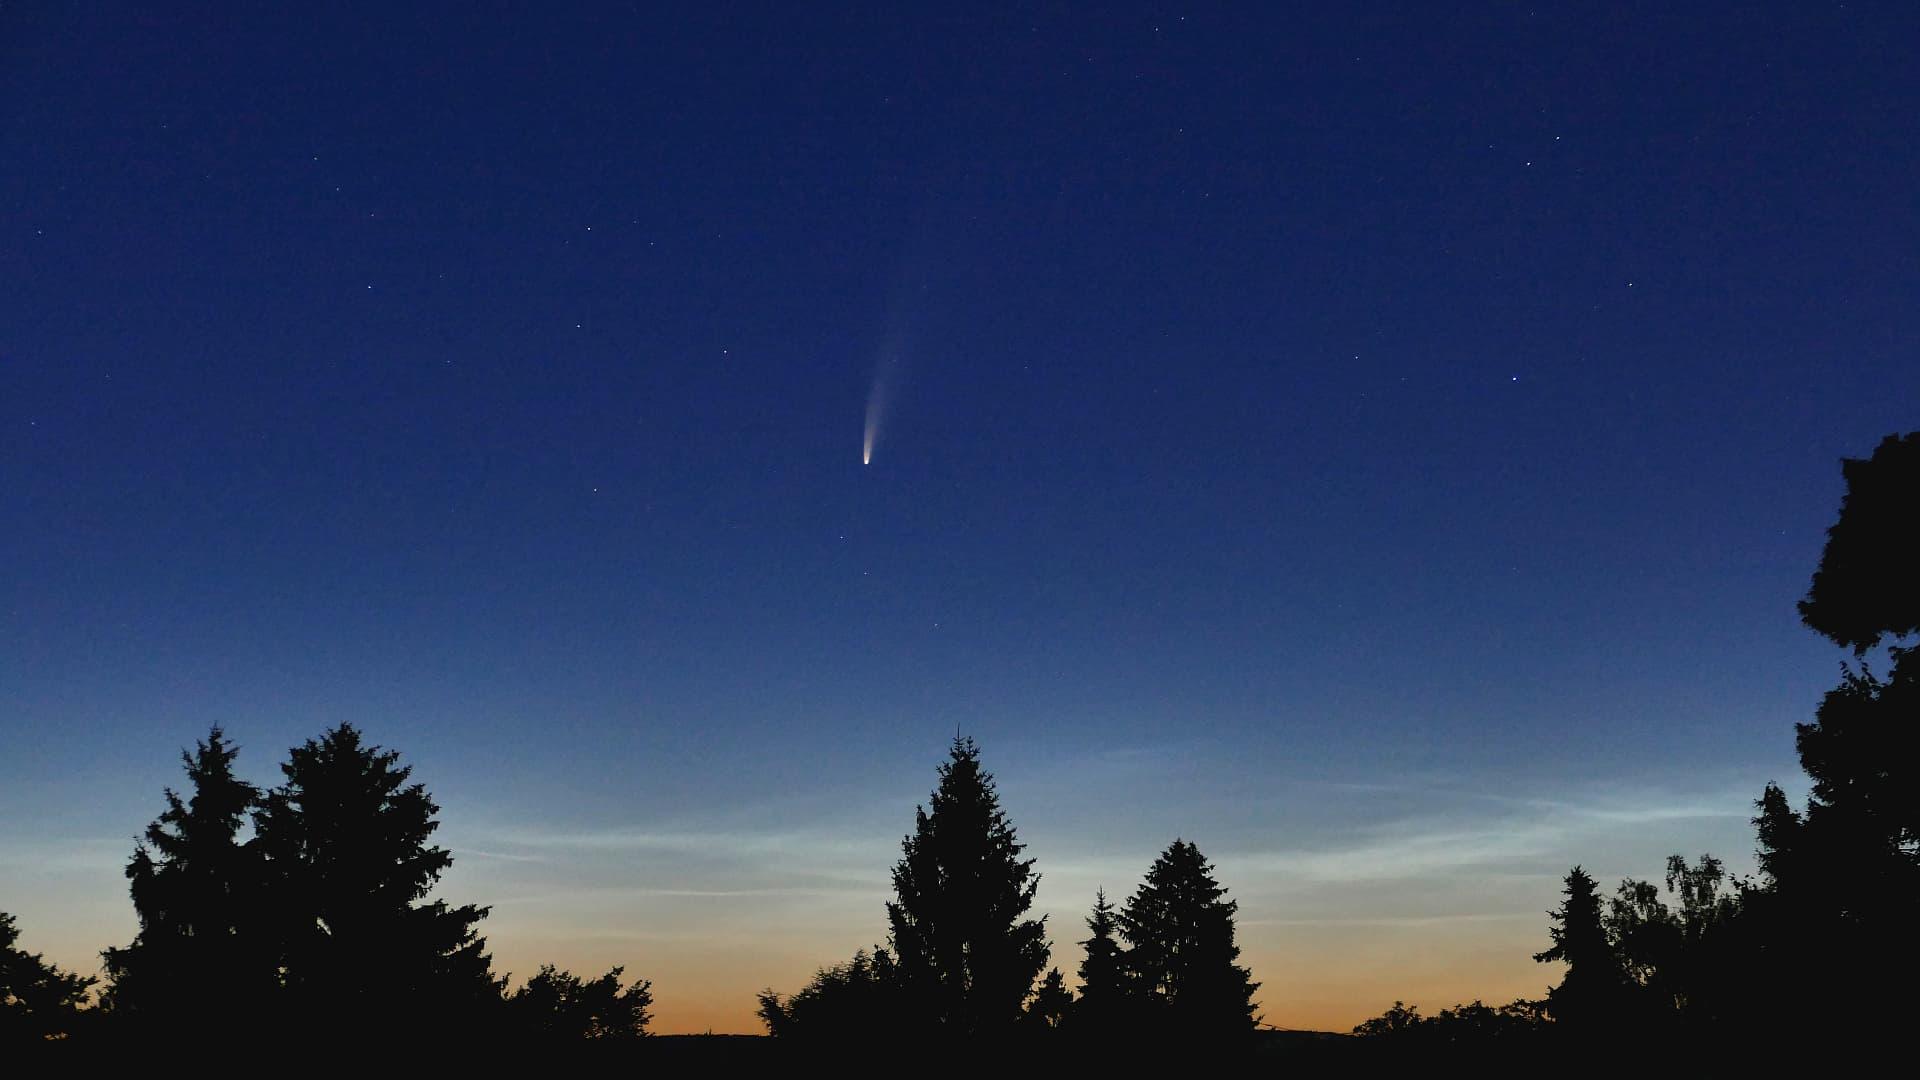 Komet Neowise am 10. Juli 2020